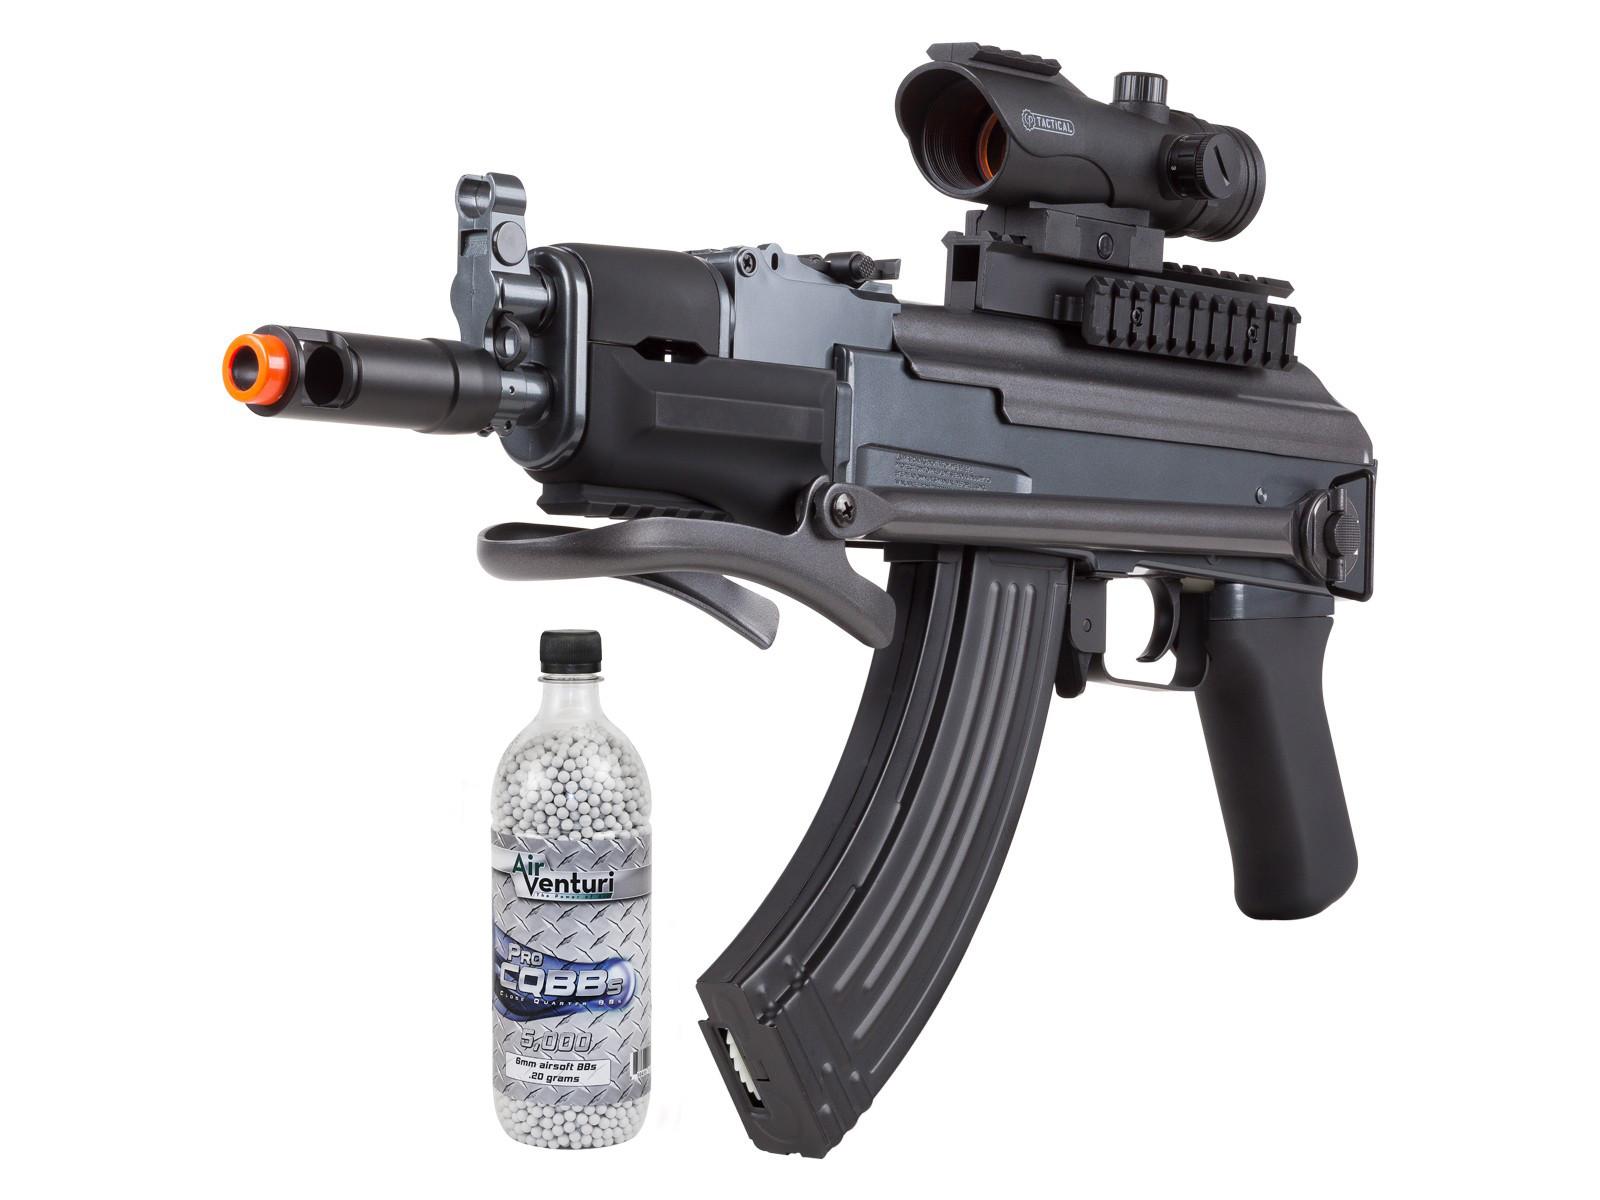 Game Face GF76 AEG Airsoft Rifle Kit, Black 6mm